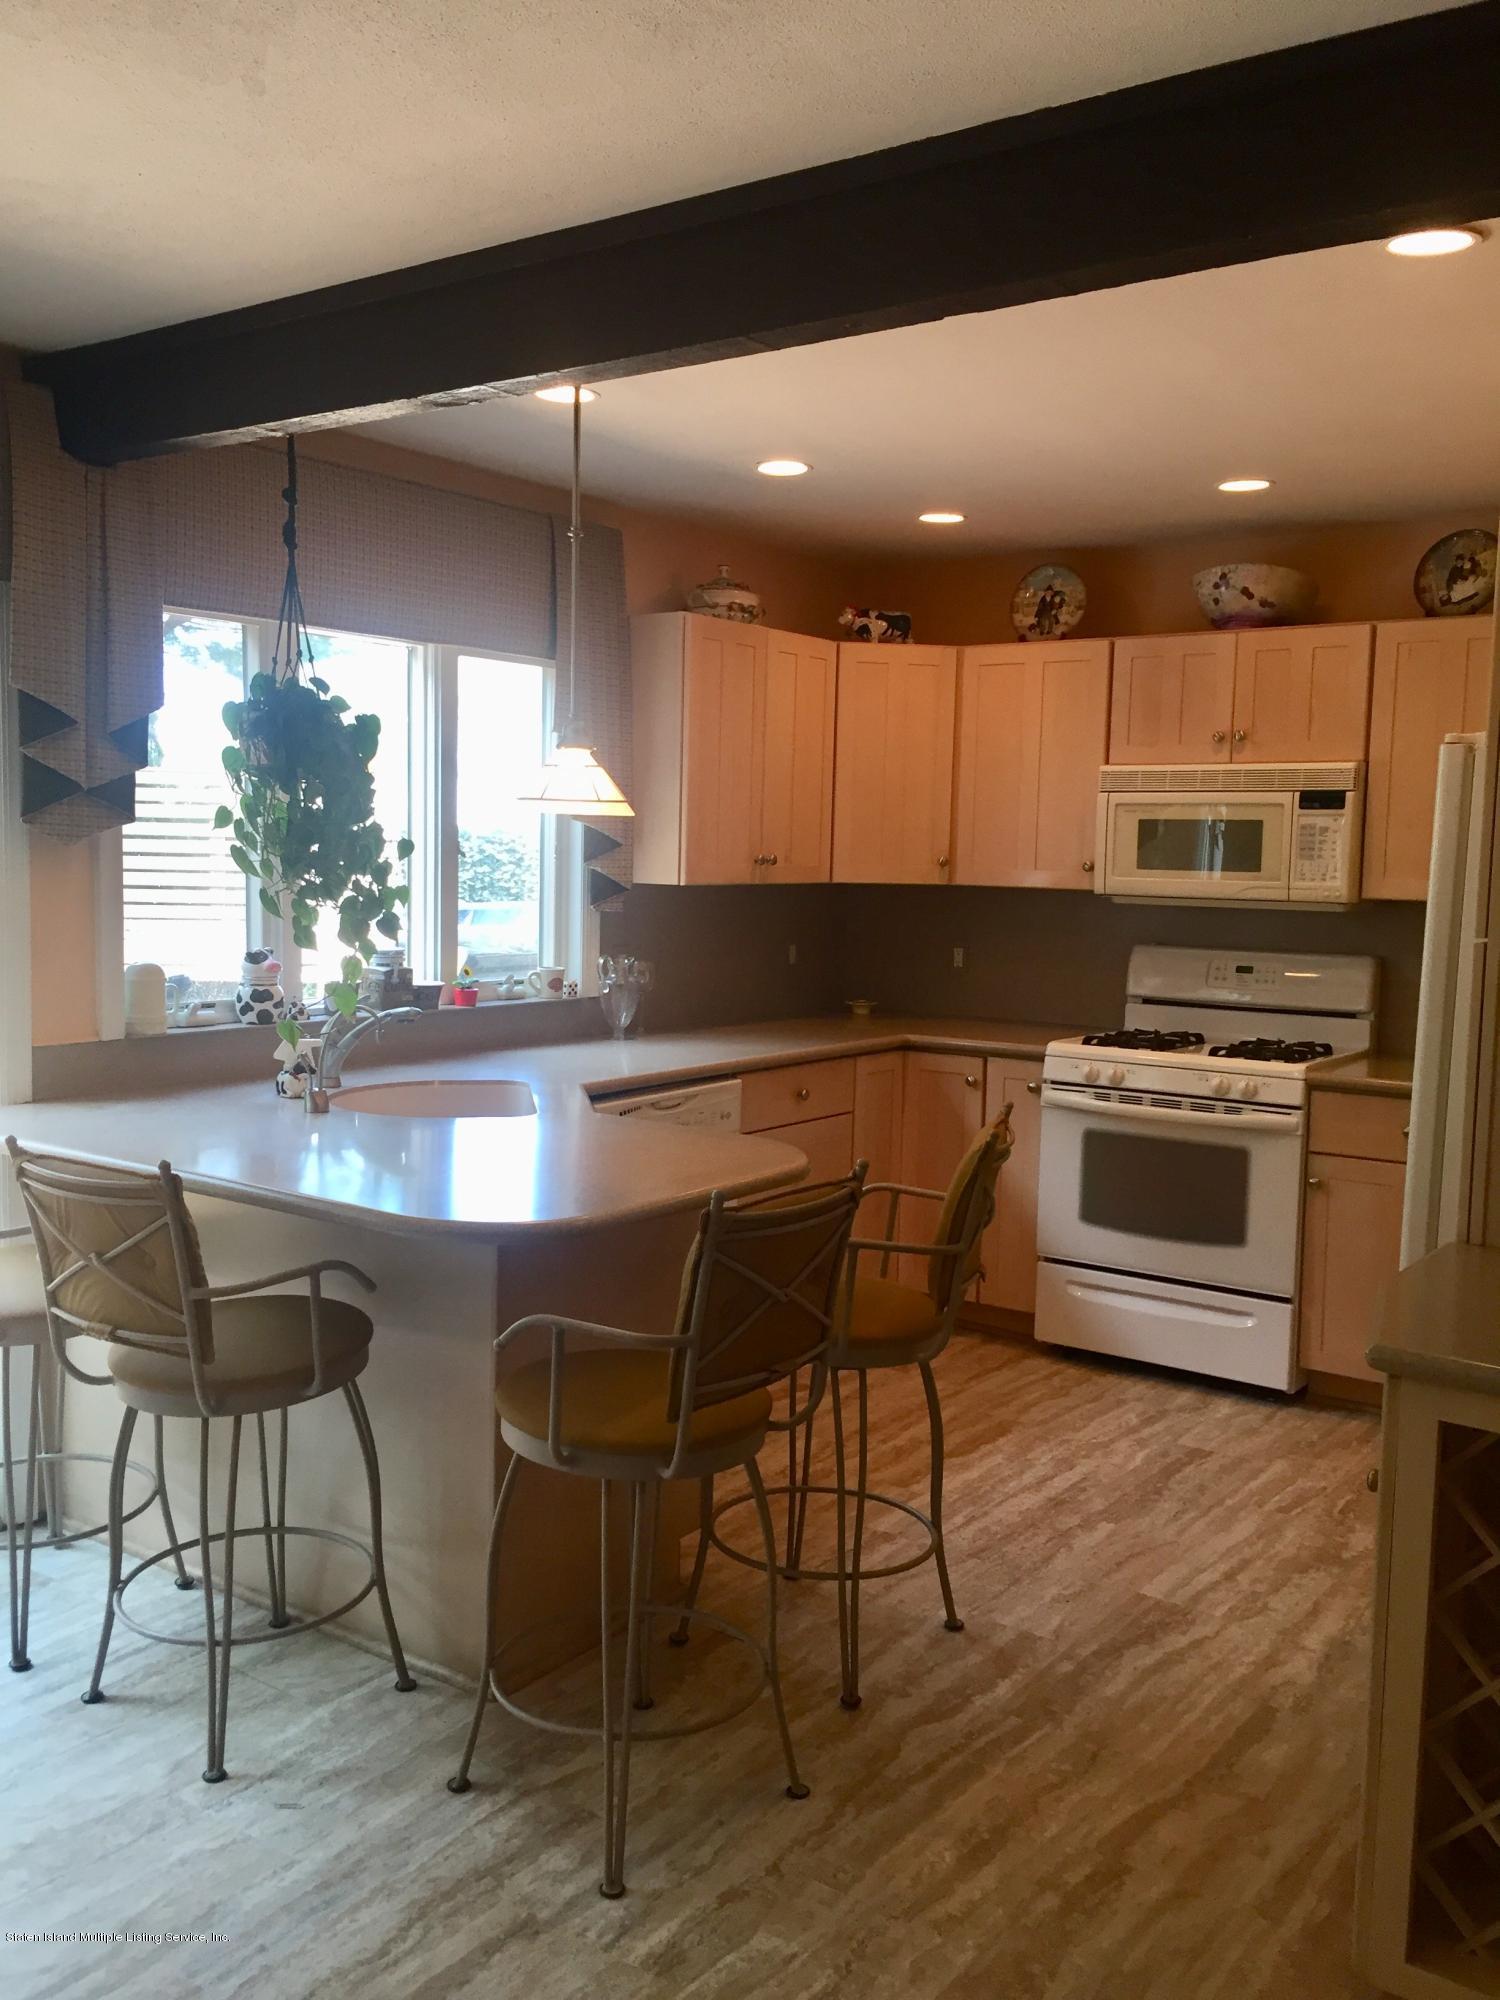 Single Family - Detached 46 Forrestal Avenue  Staten Island, NY 10312, MLS-1131922-14